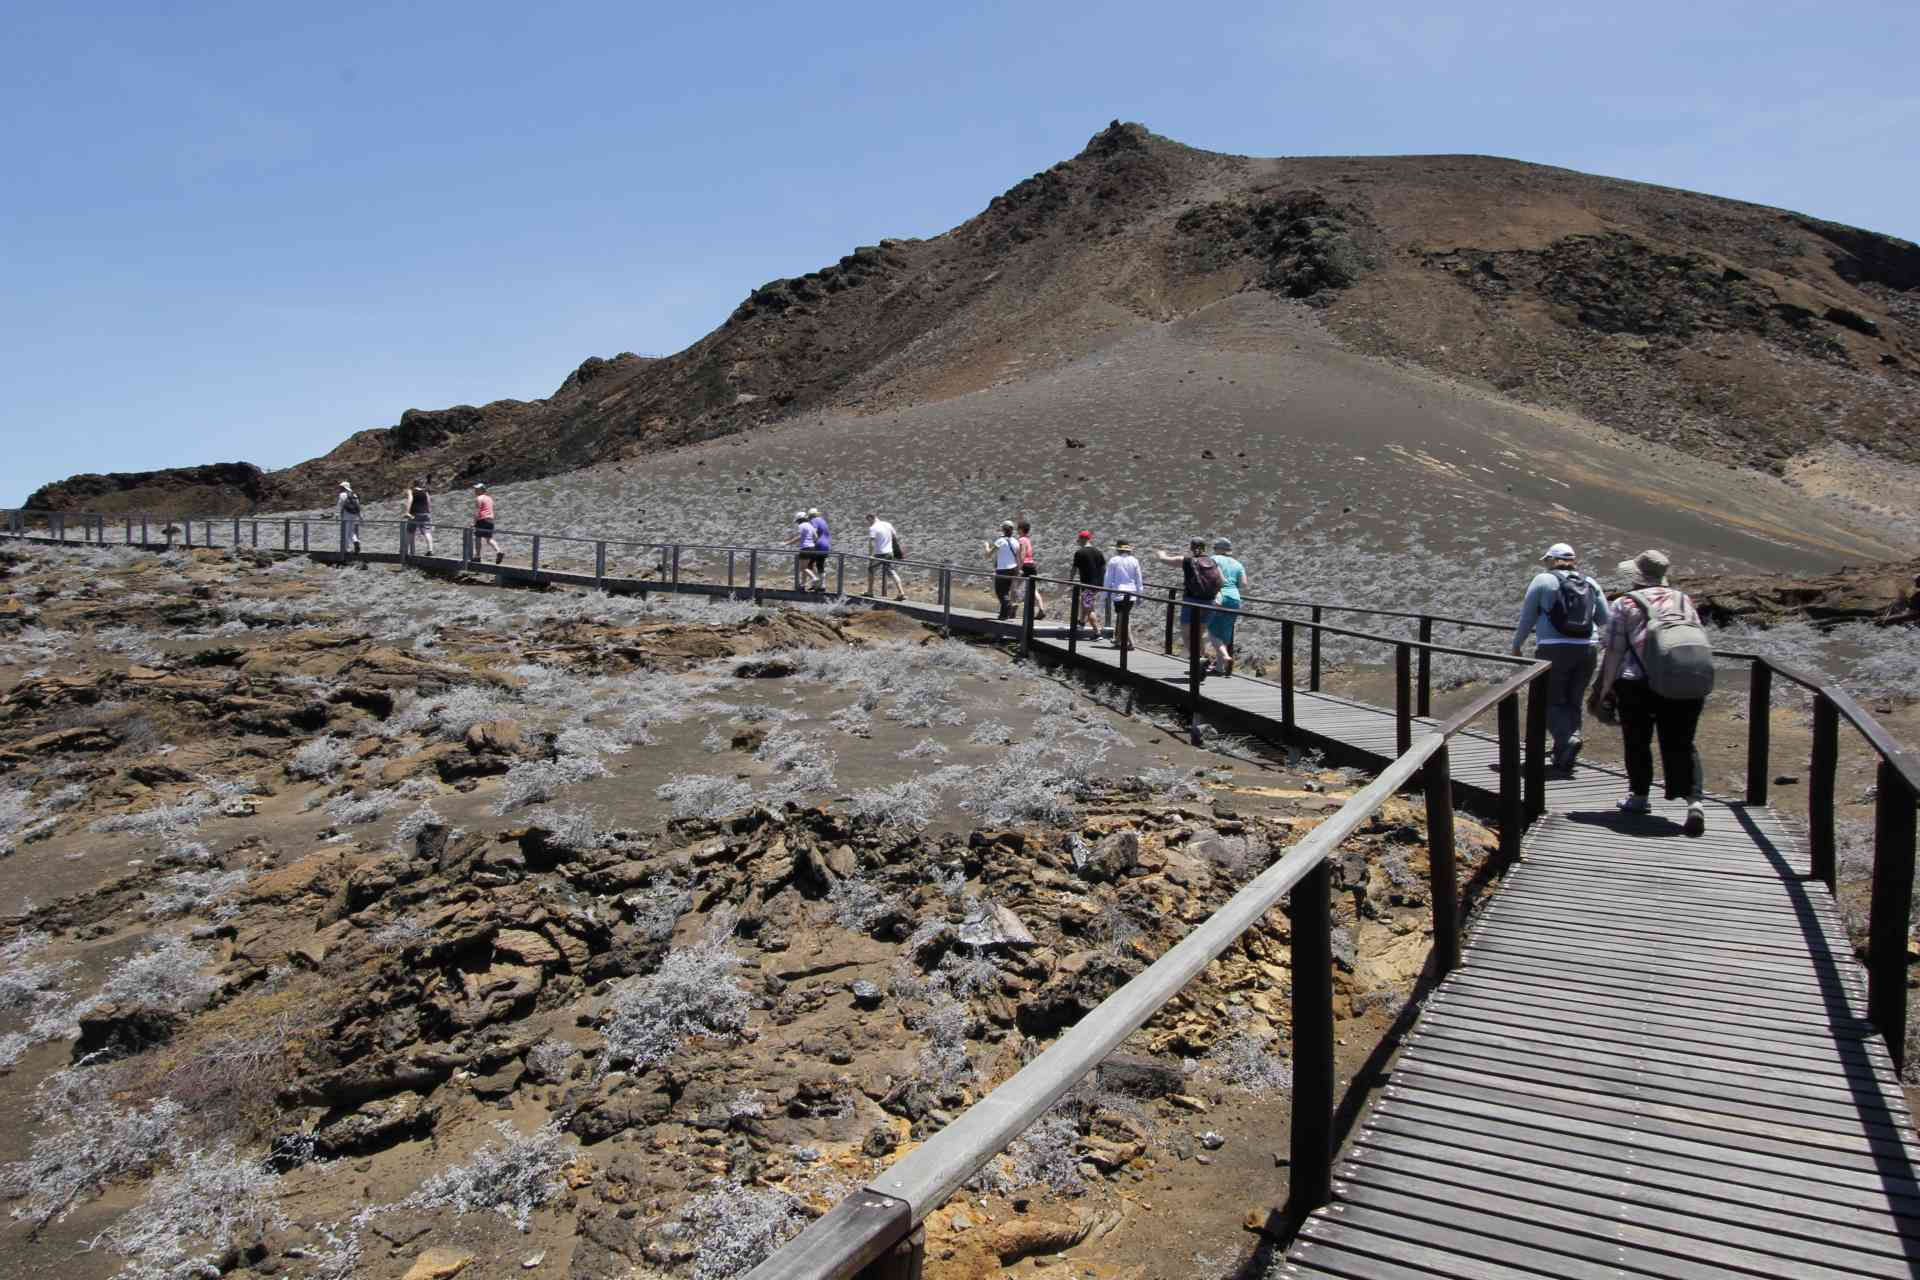 Exploring the Galapagos Islands, Ecuador by David Hammett